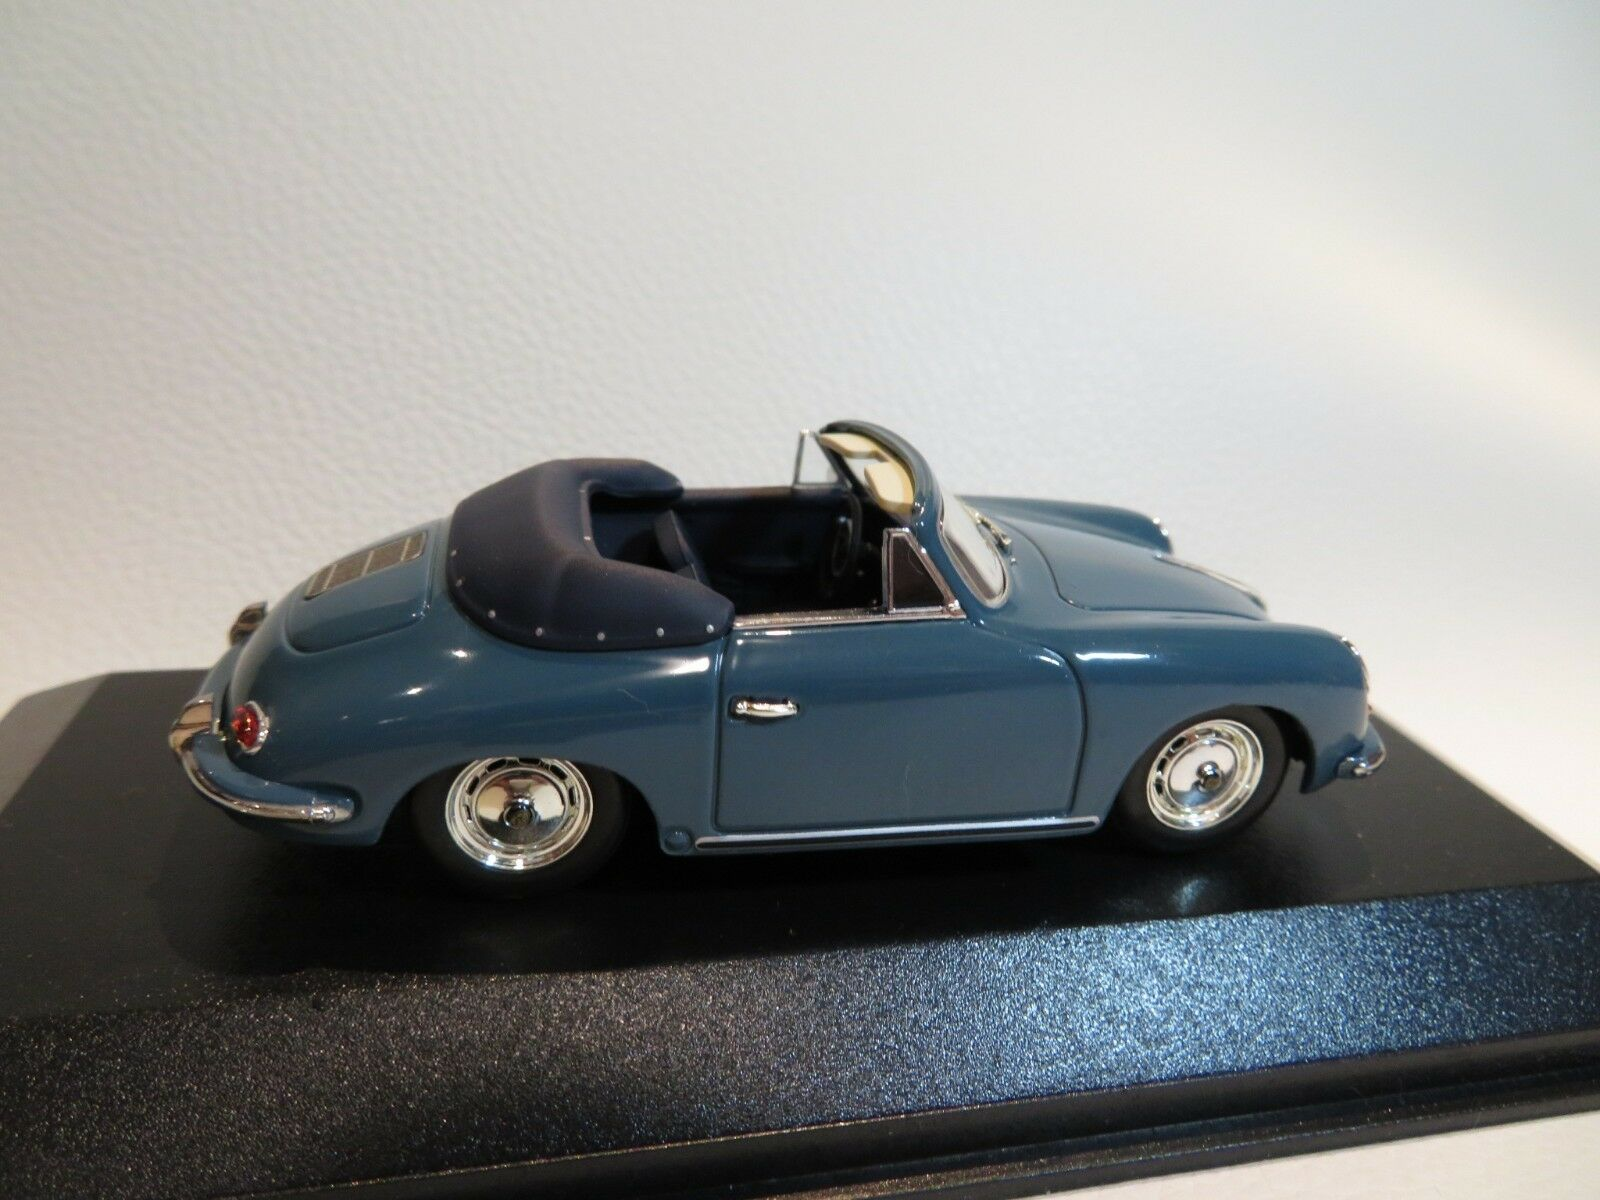 1 43 Minichamps Porsche 356 B Cabriolet Cabriolet Cabriolet (1960) diecast 7efd67